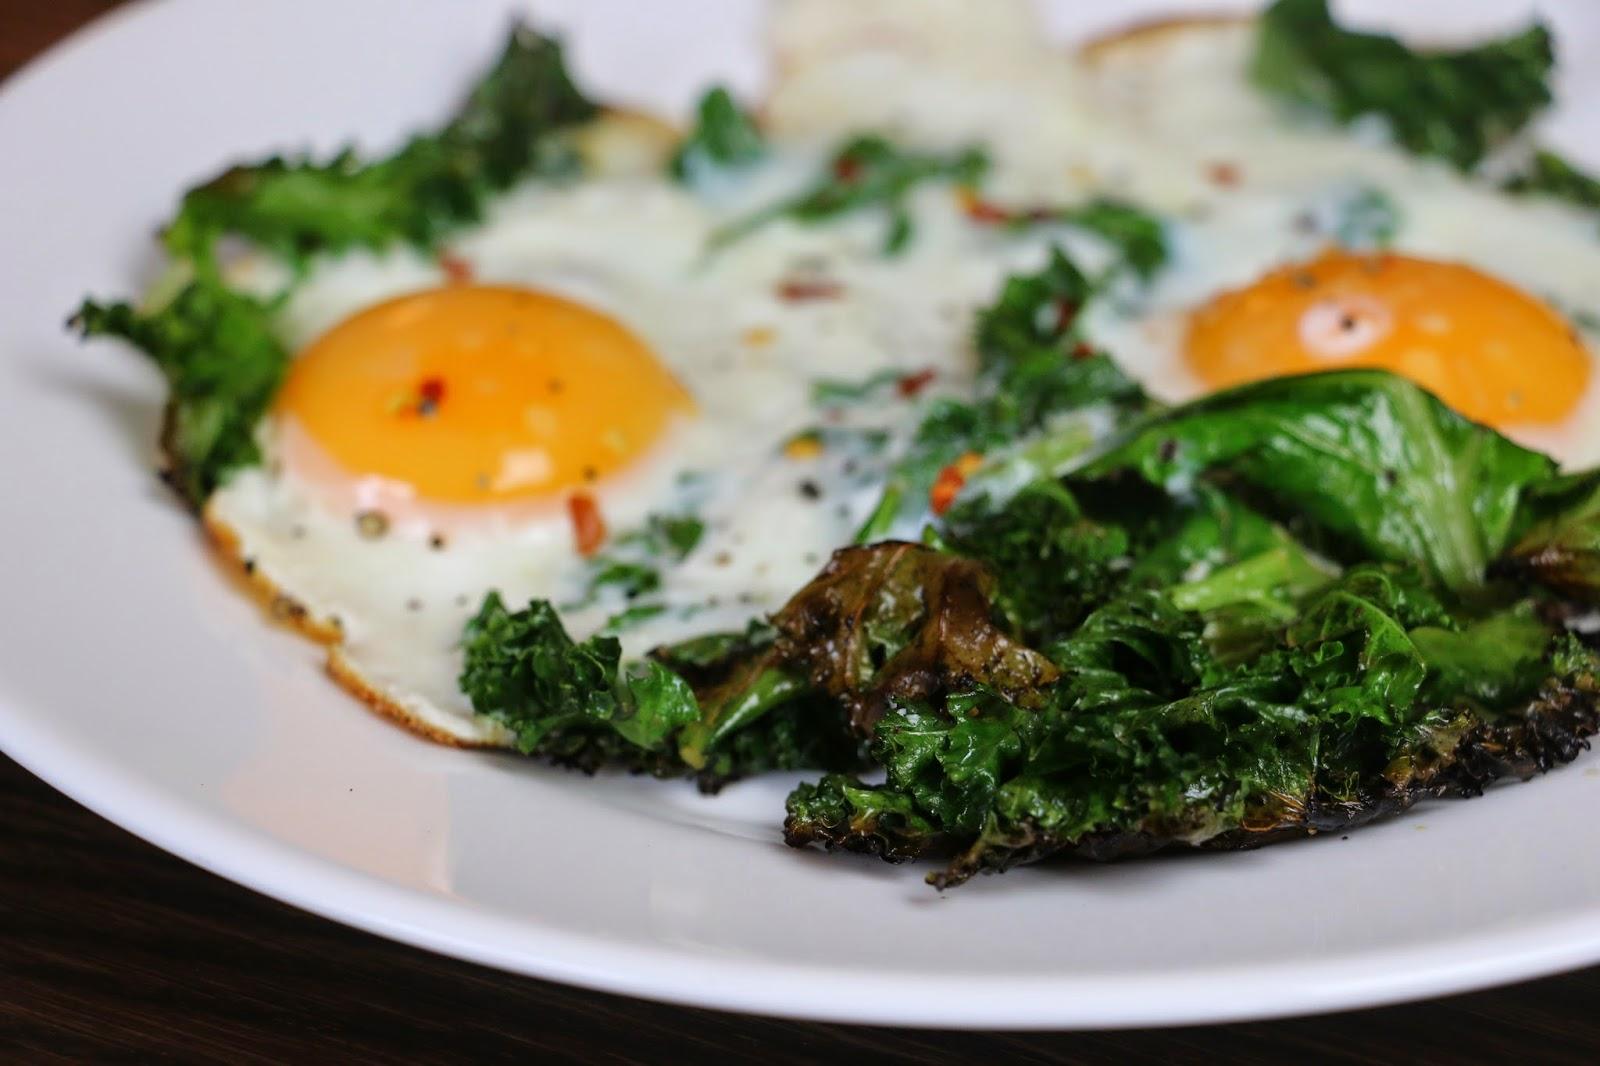 Crispy Curly Kale Fried Eggs